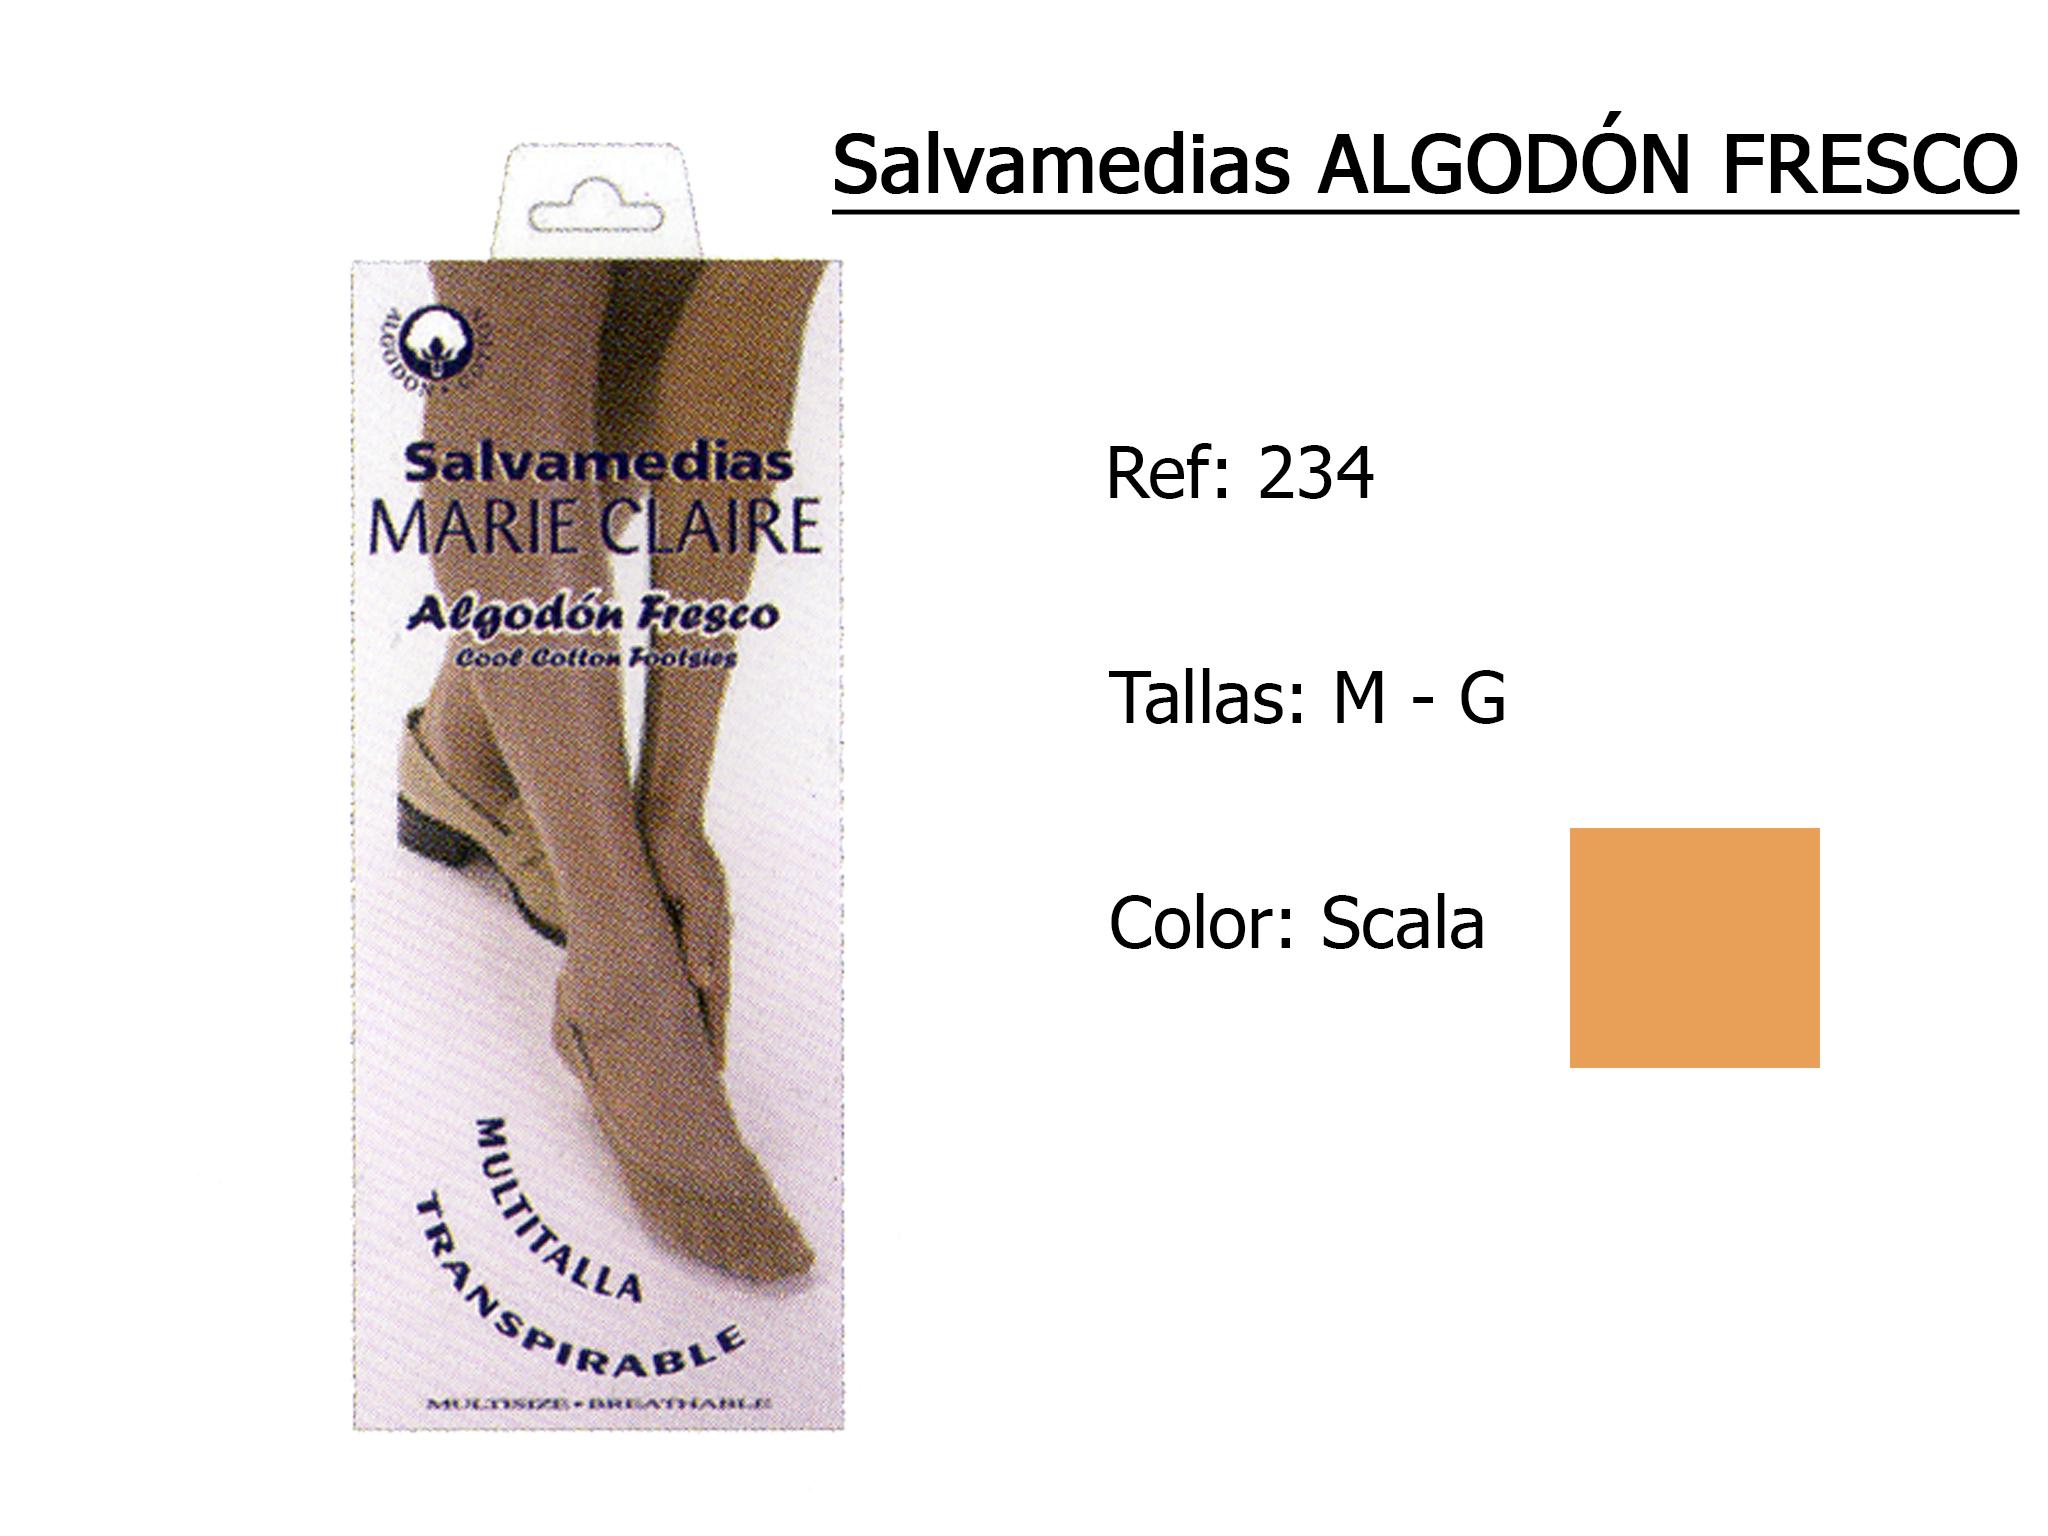 SALVAMEDIAS algodon fresco 234